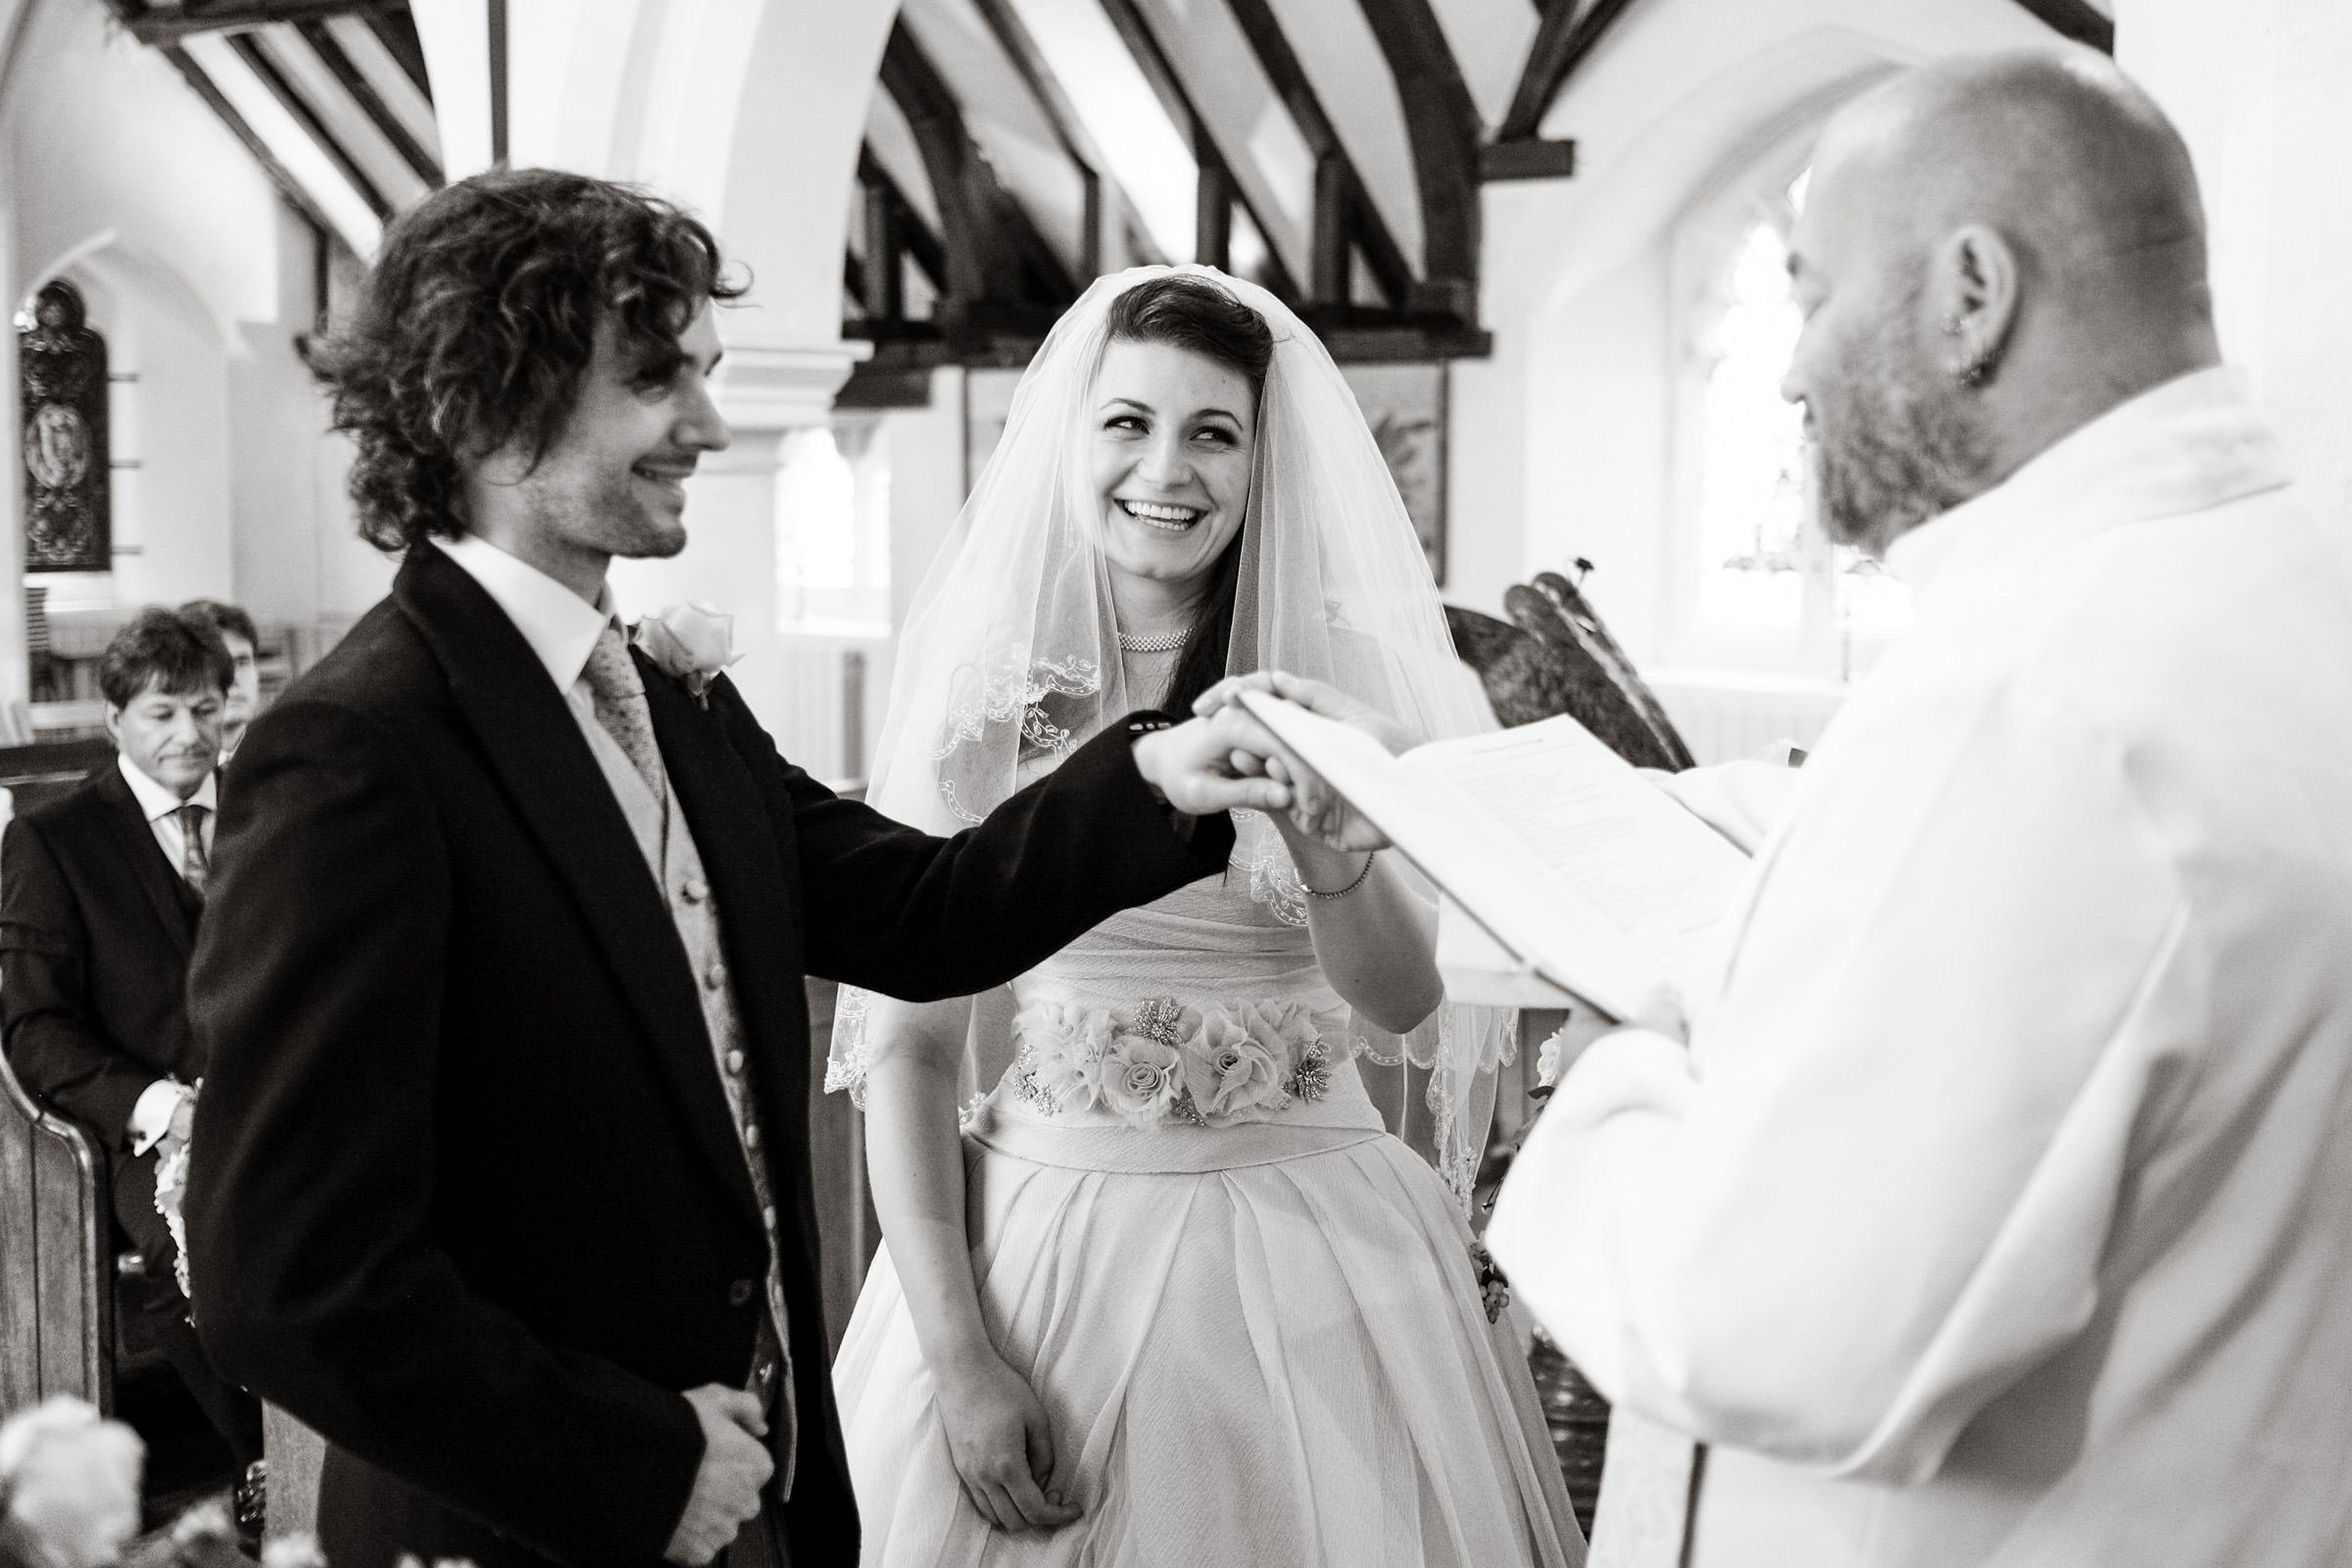 Wedding+at+De+Vere+Gorse+Hill+in+Surrey+015.jpg